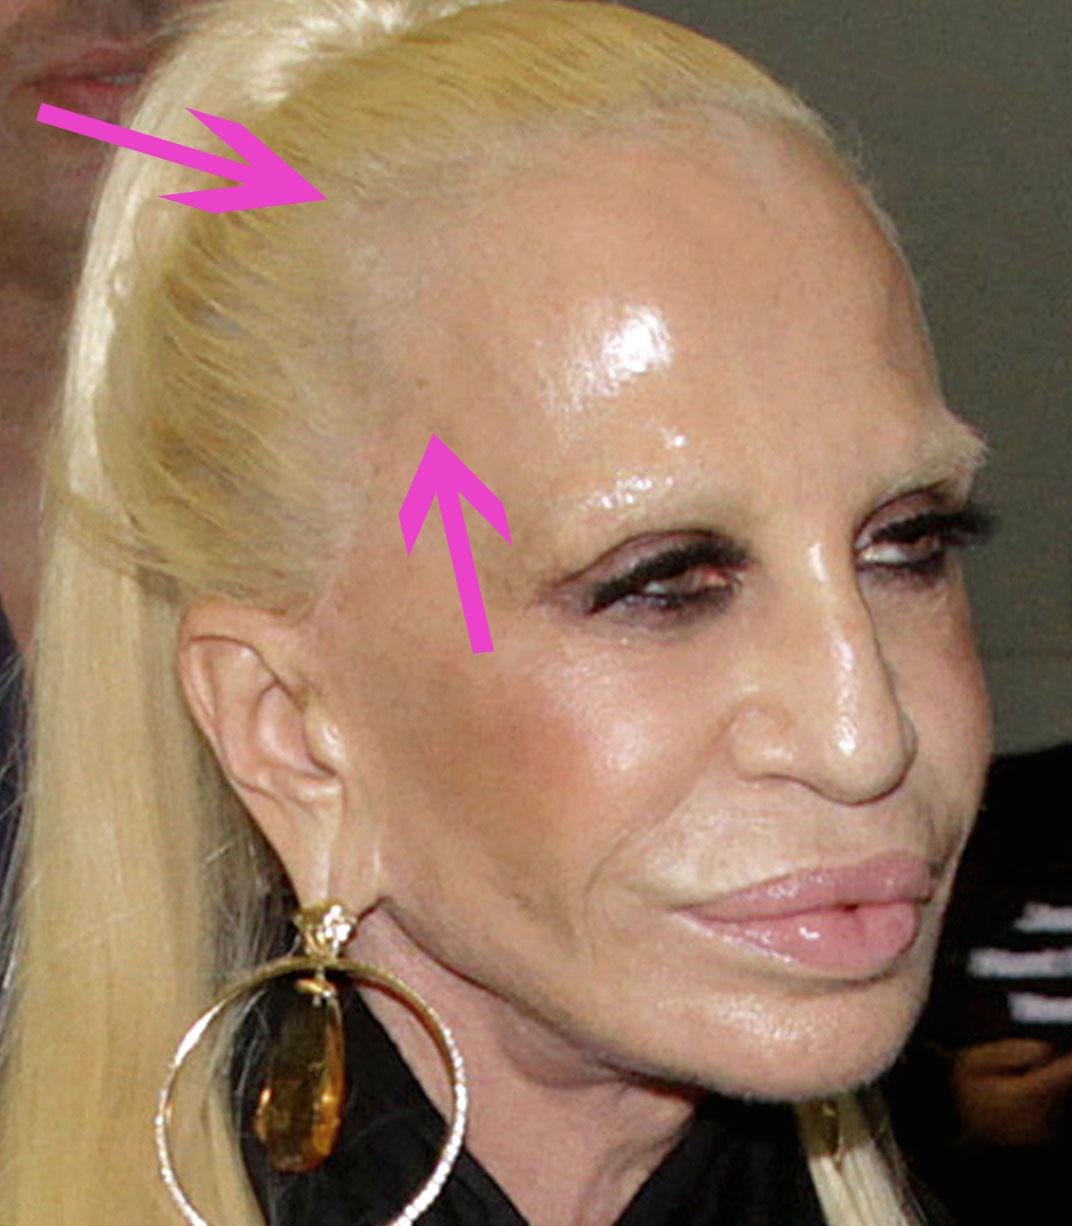 donatella plastic surgery face